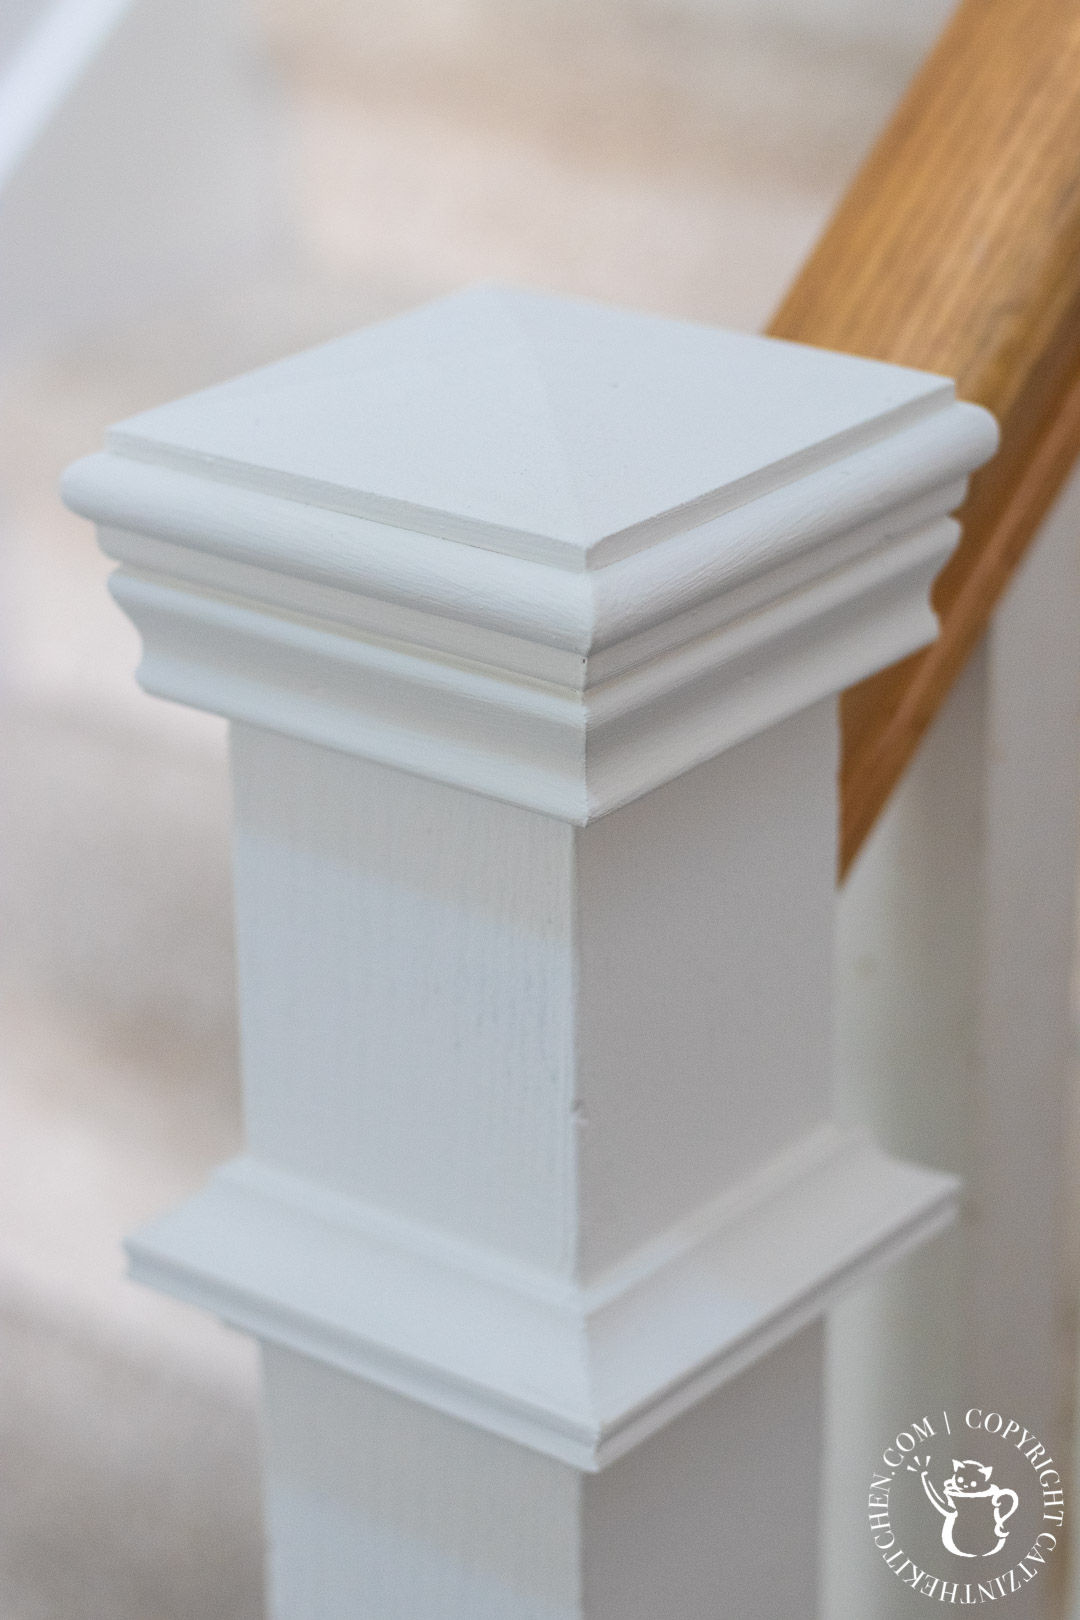 painted newel post cap